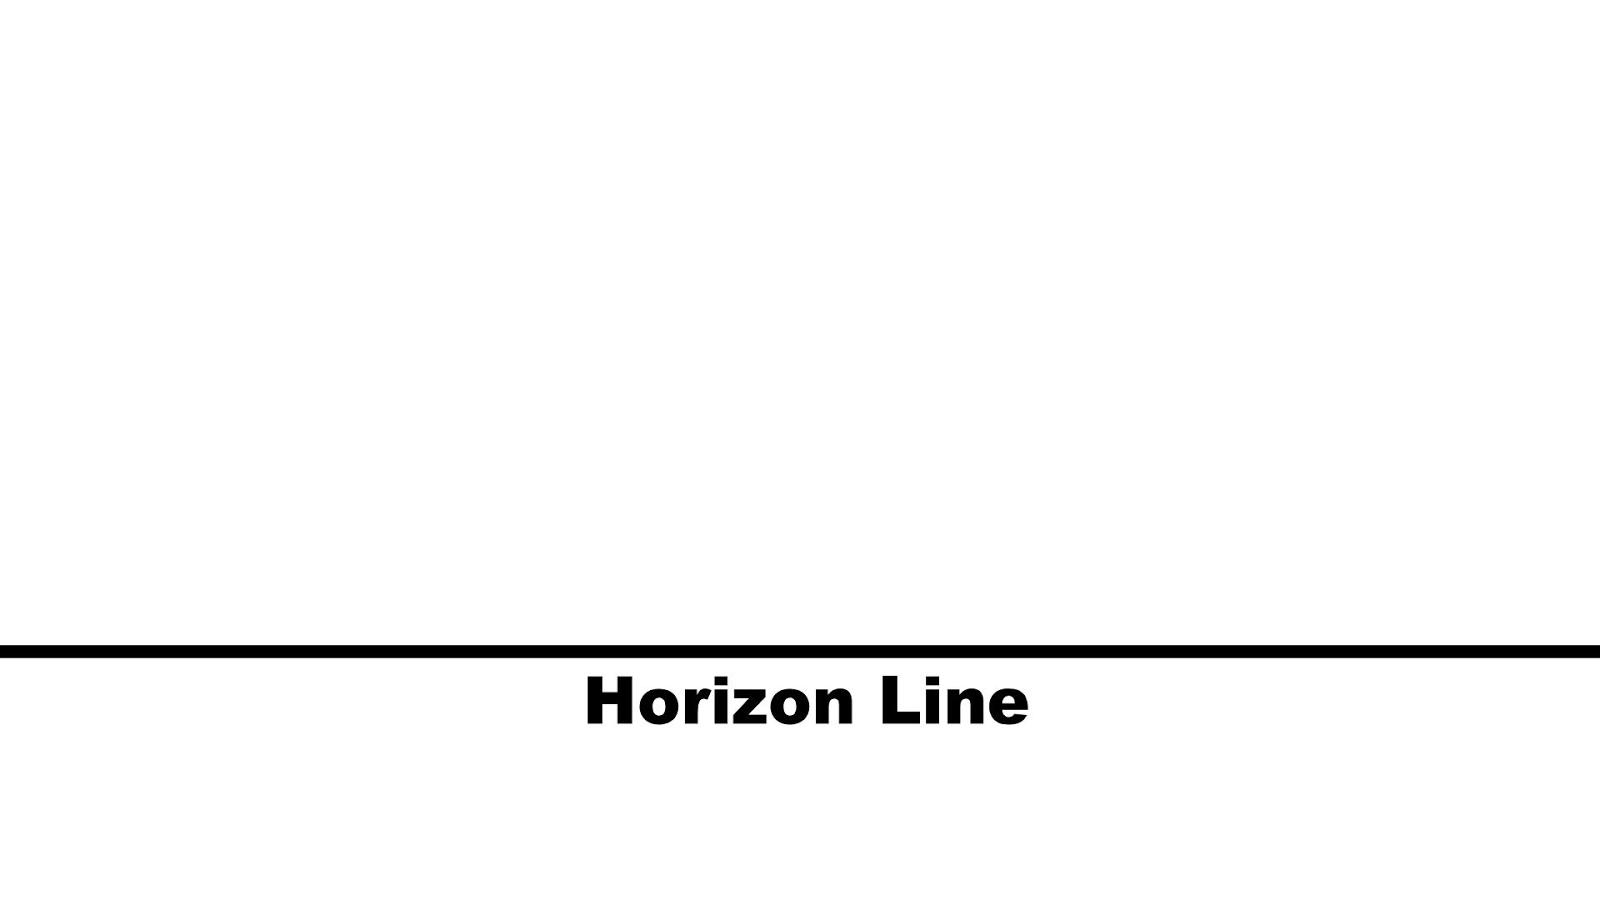 Horizon Line Art Definition : Animateducated september